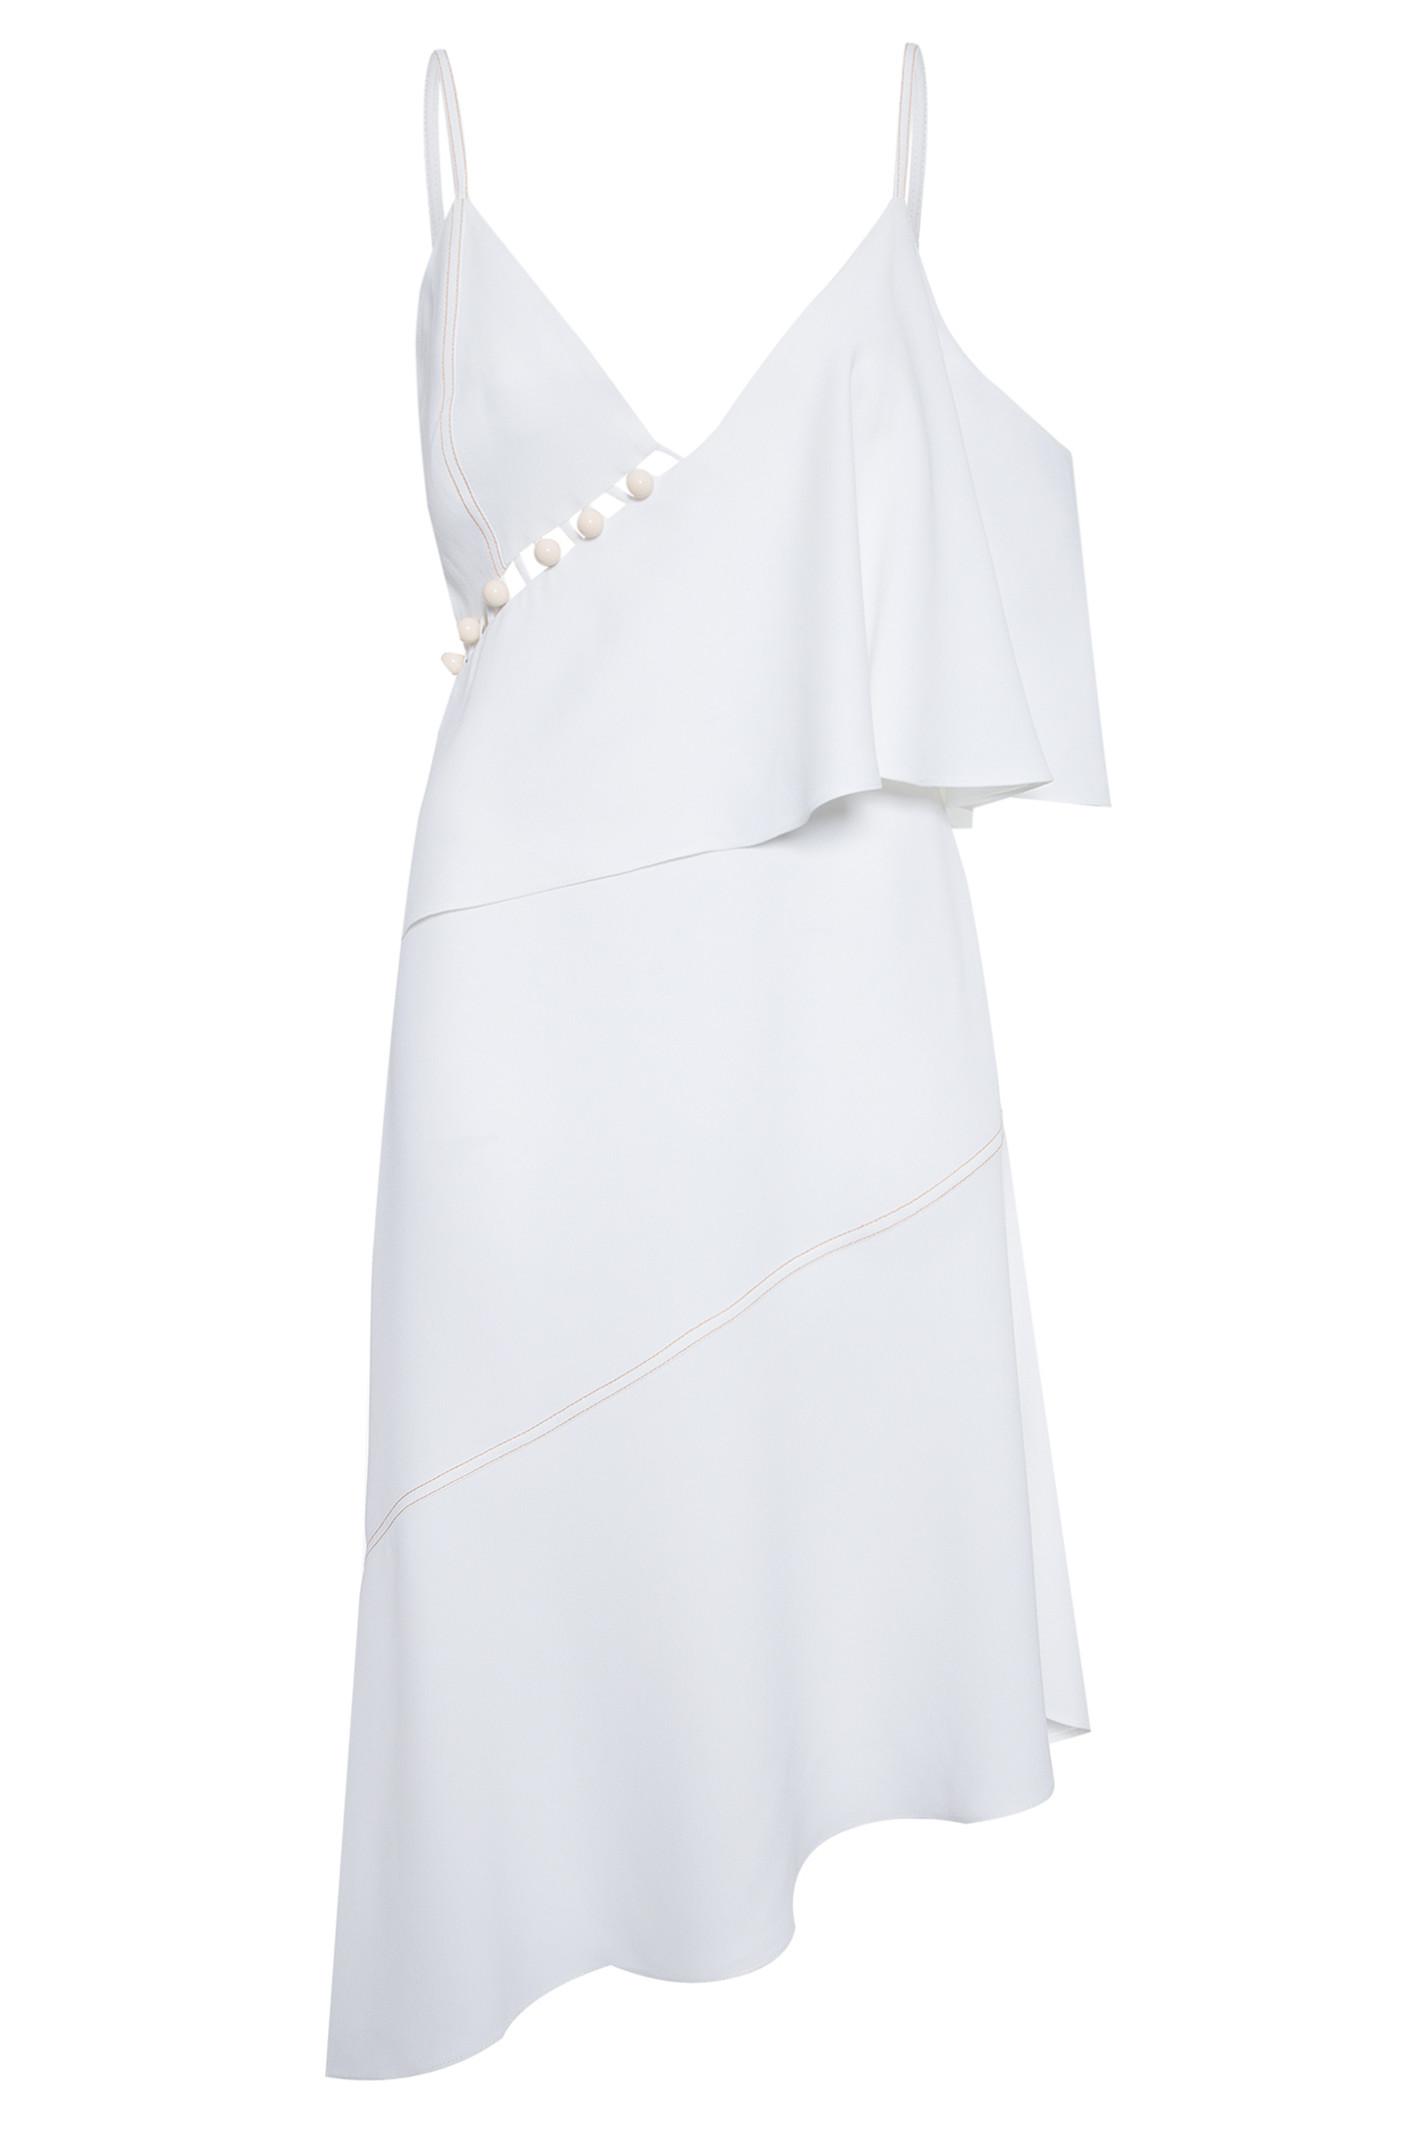 Vestido Patou Assimétrico - Branco